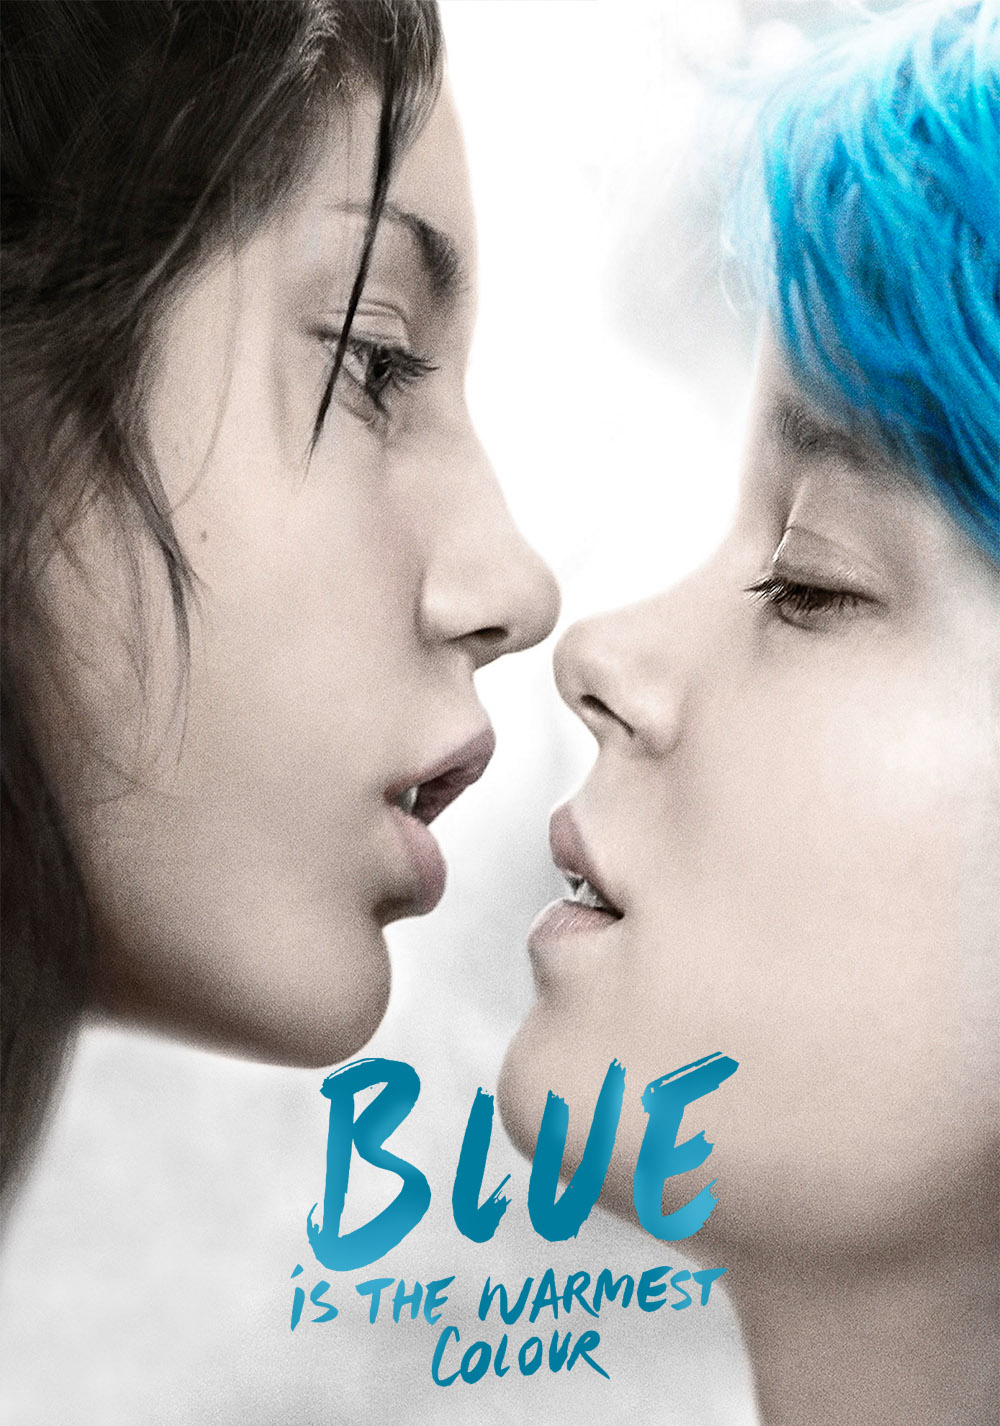 Blue is the warmest color compilation 7